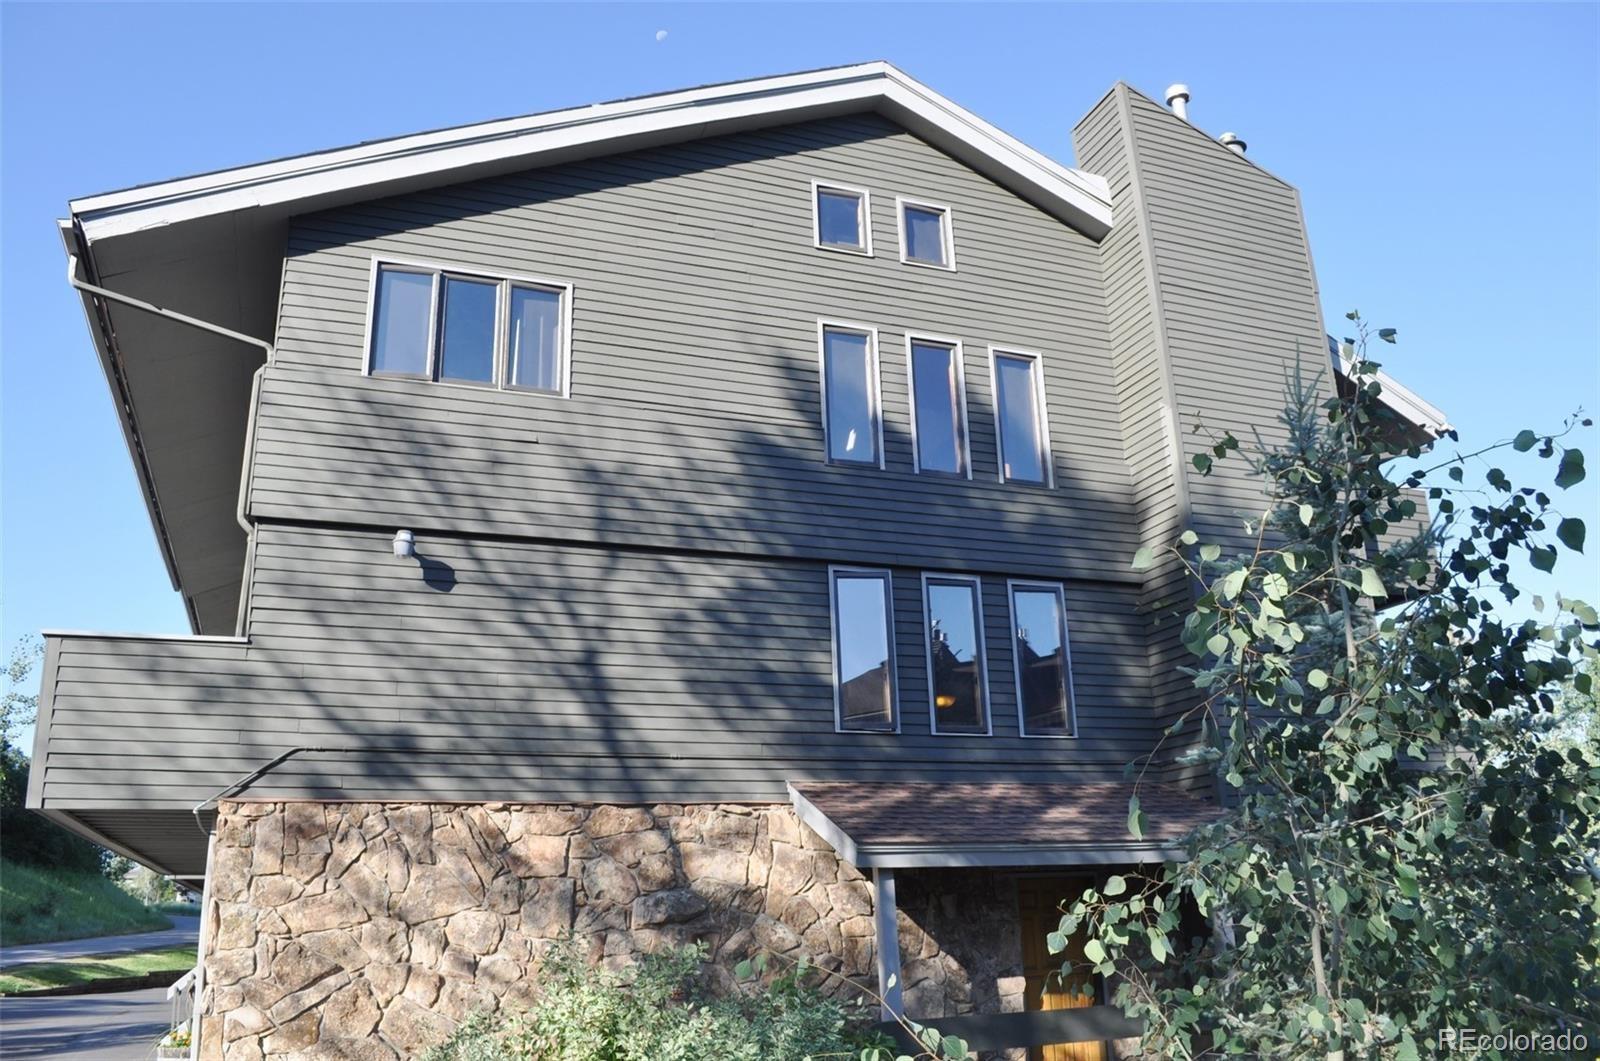 MLS# 2309963 - 39 - 1145 Overlook Drive #C1, Steamboat Springs, CO 80487